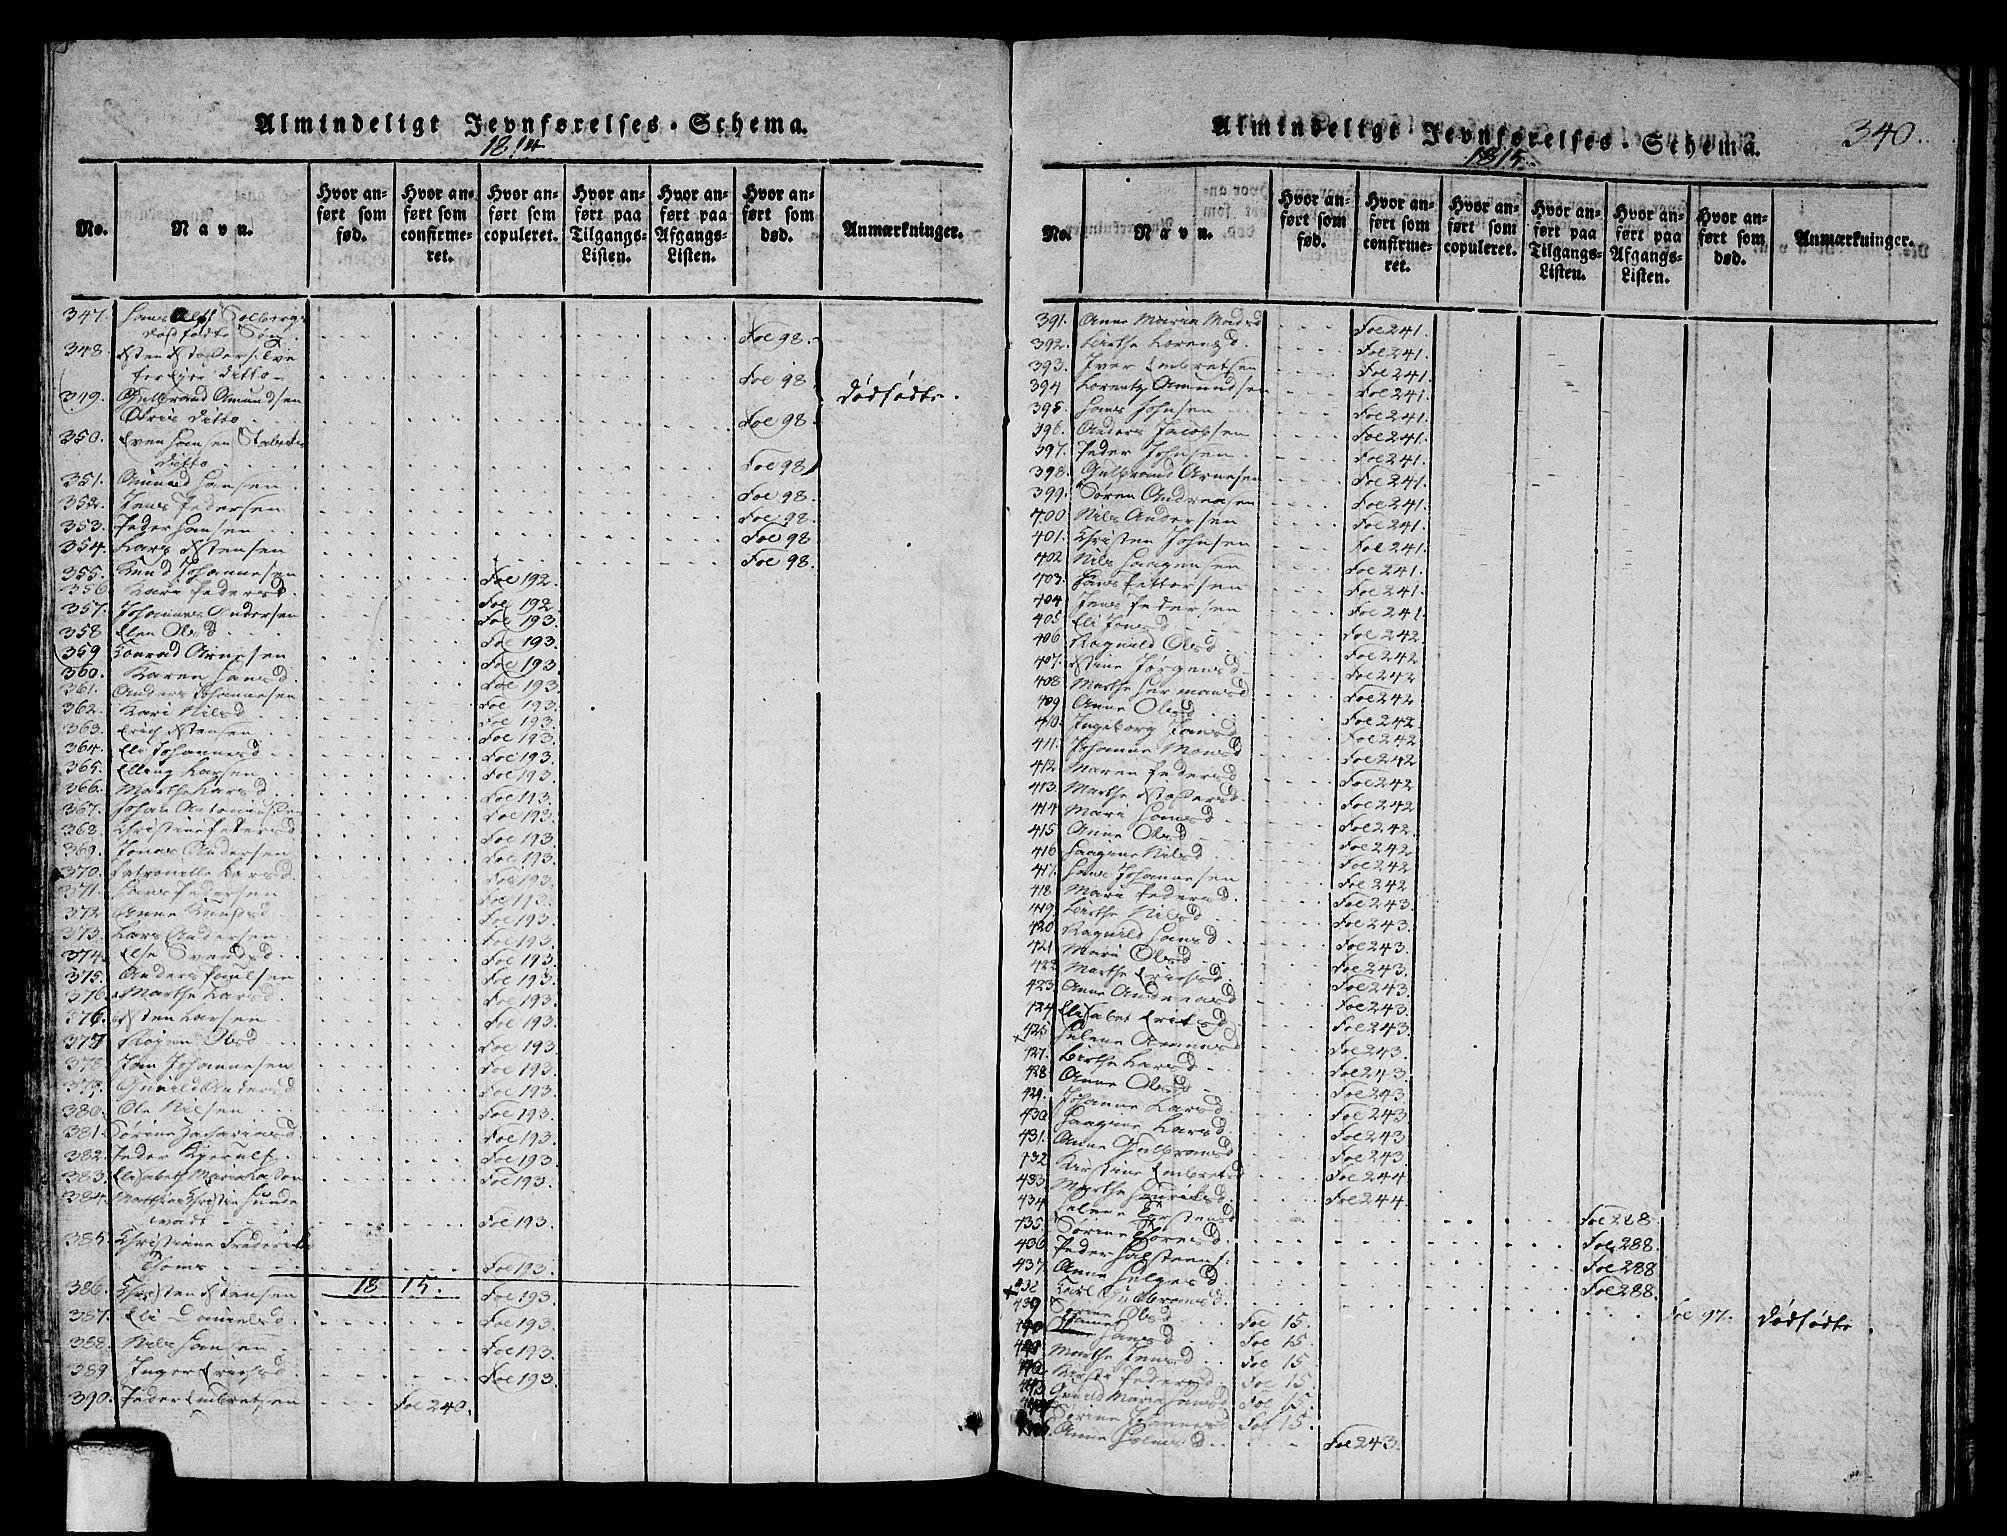 SAO, Asker prestekontor Kirkebøker, G/Ga/L0001: Klokkerbok nr. I 1, 1814-1830, s. 340